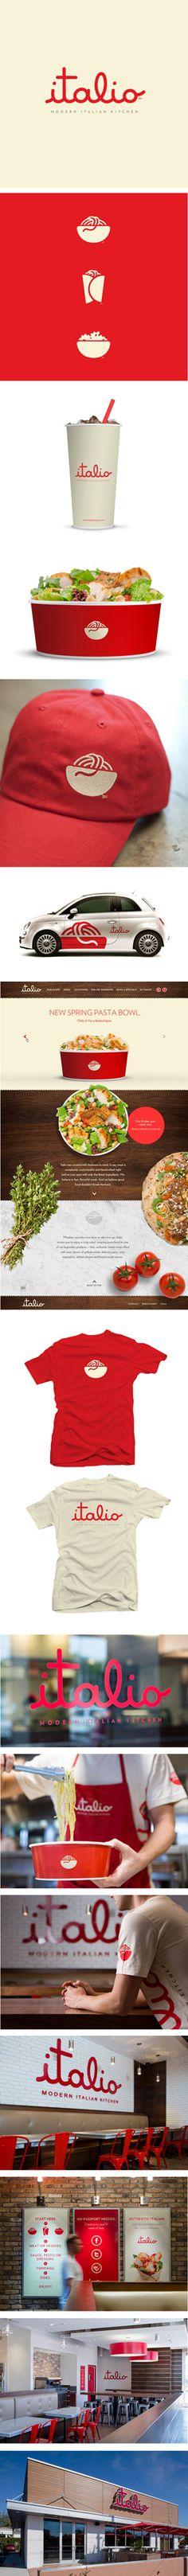 Italio Modern Kitchen Identity and Collateral | Designer: Push